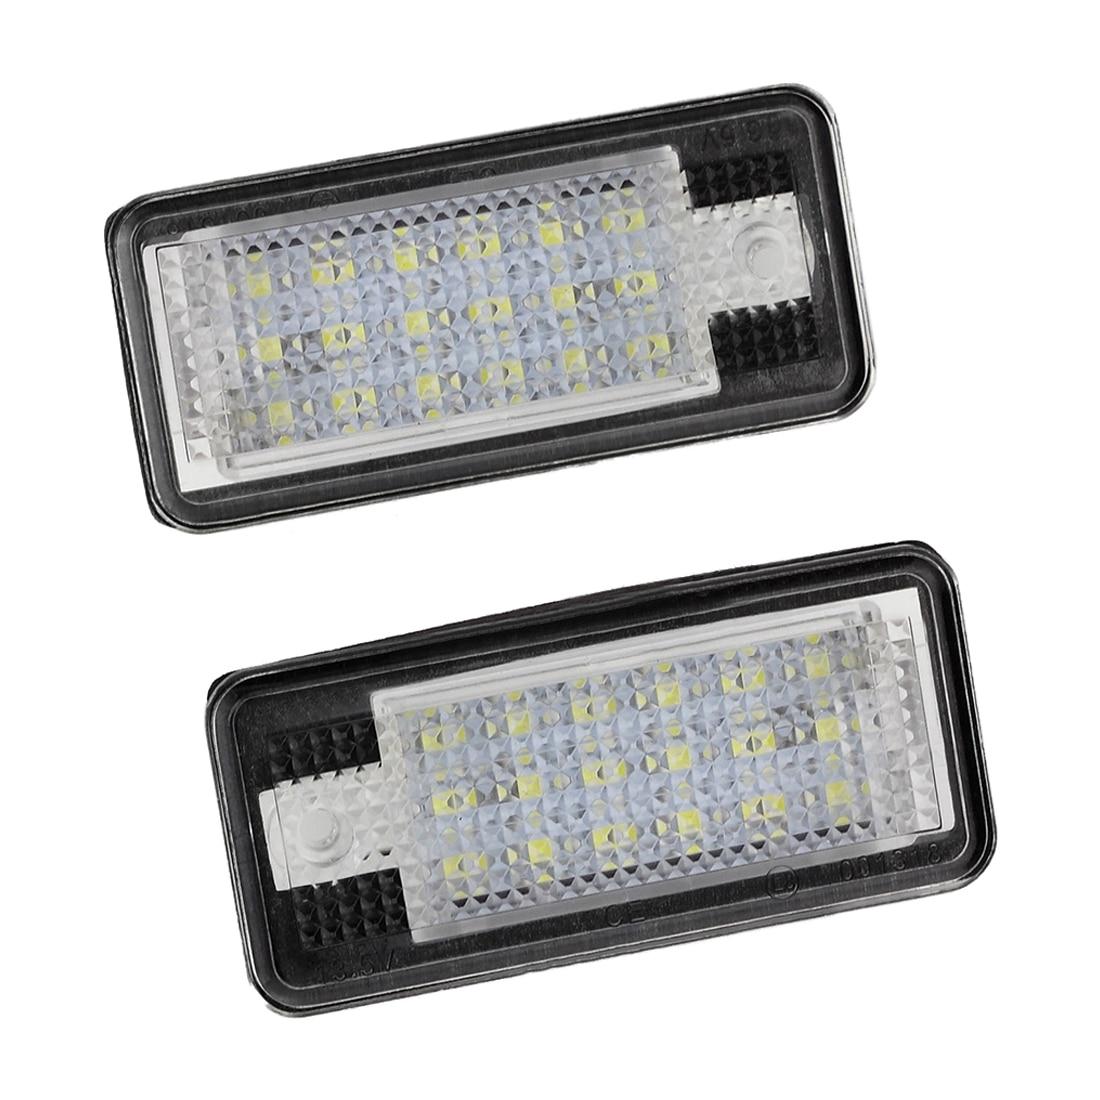 2x 18 LED License Number Plate Light Lamp For Audi A3 S3 A4 S4 B6 A6 S6 A8 S8 Q7 0001108175 0986018340 458211 new starter for audi a4 a6 quattro volkswagen passat 2 8 3 0 4 2 l